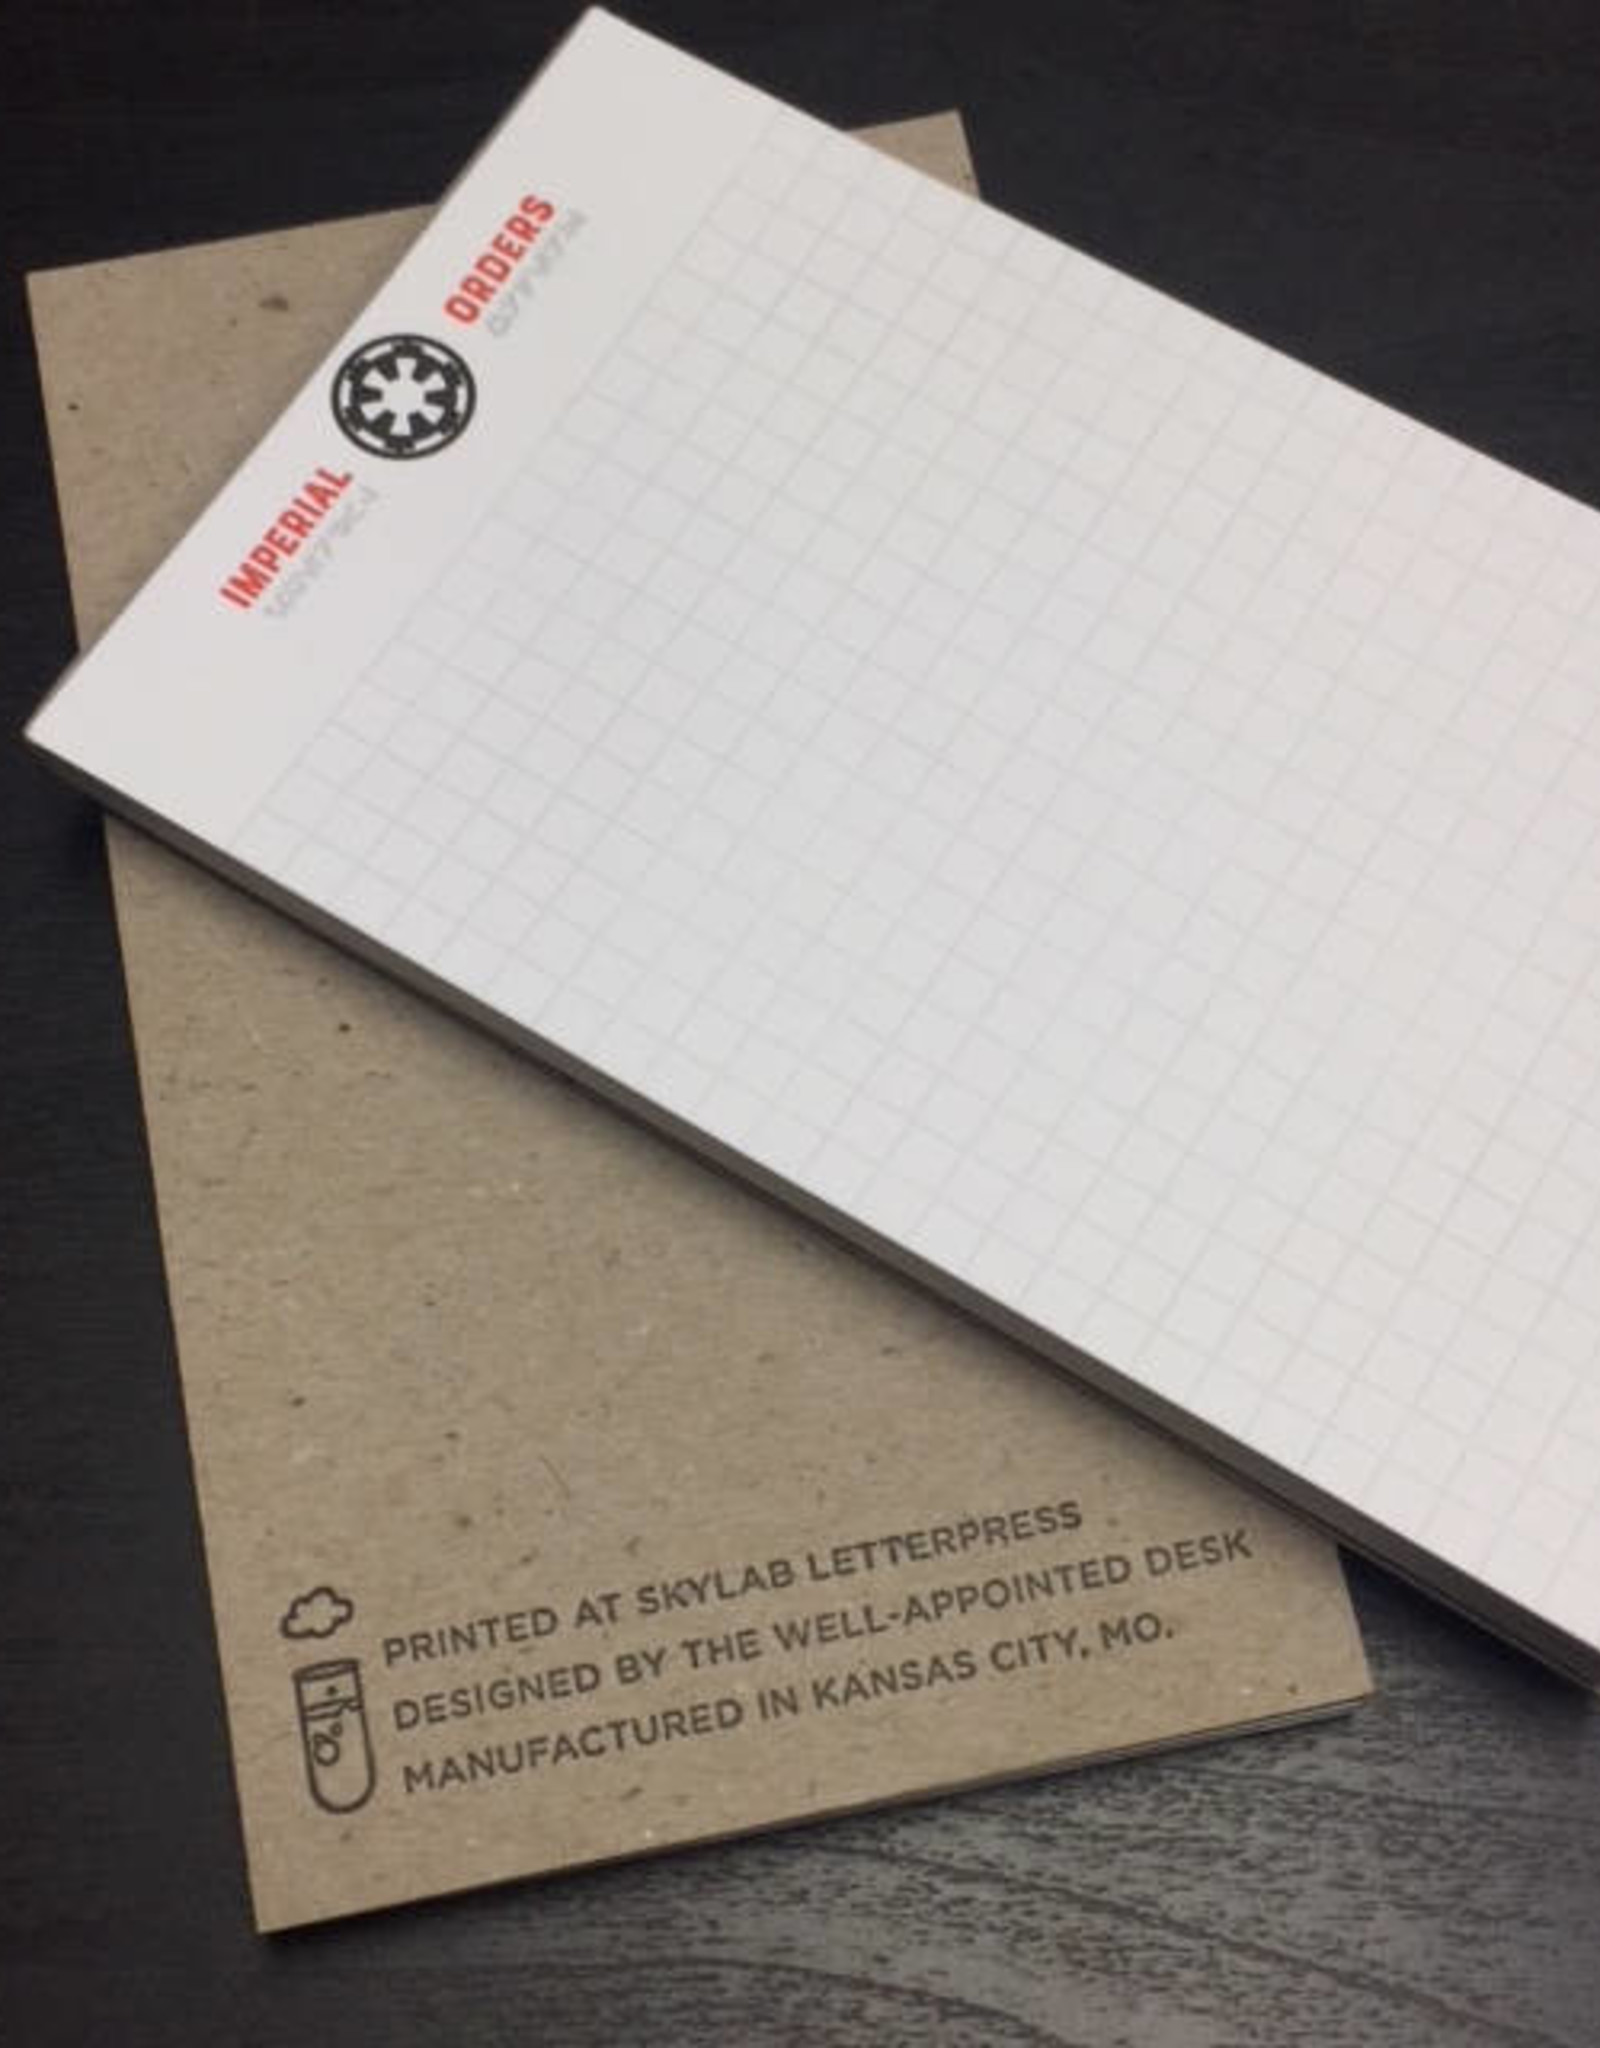 Skylab Letterpress Star Wars Notepads by Skylab Letterpress